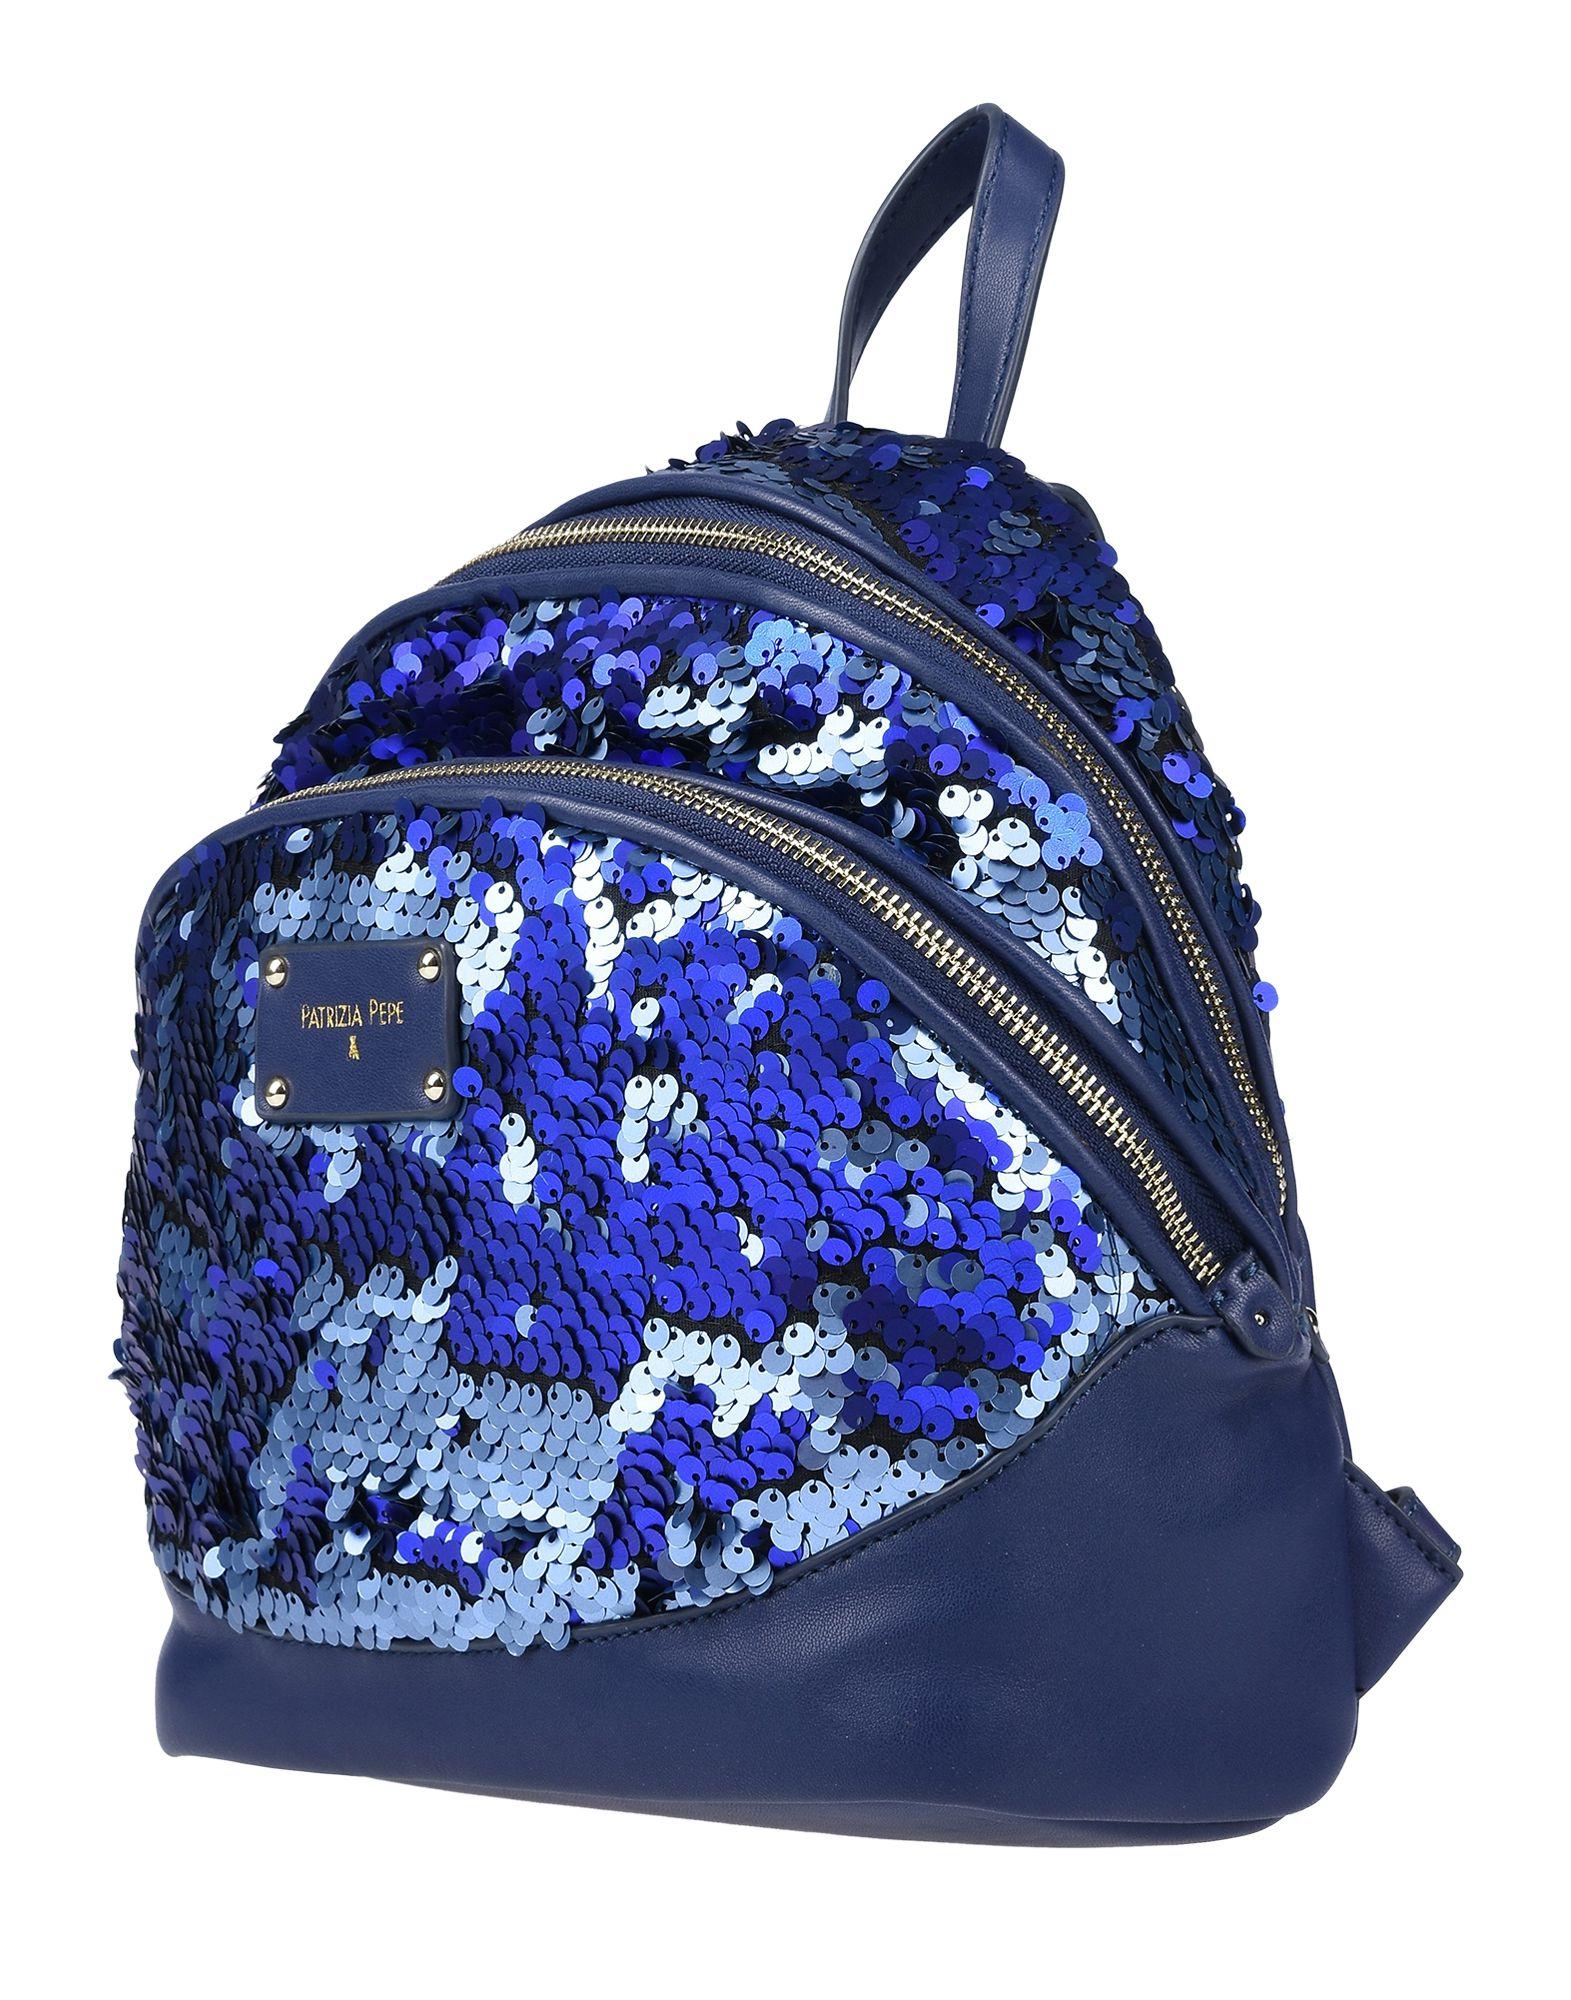 PATRIZIA PEPE Рюкзаки и сумки на пояс сумки magnolia сумка женская a761 7363 лак искусственная кожа page 8